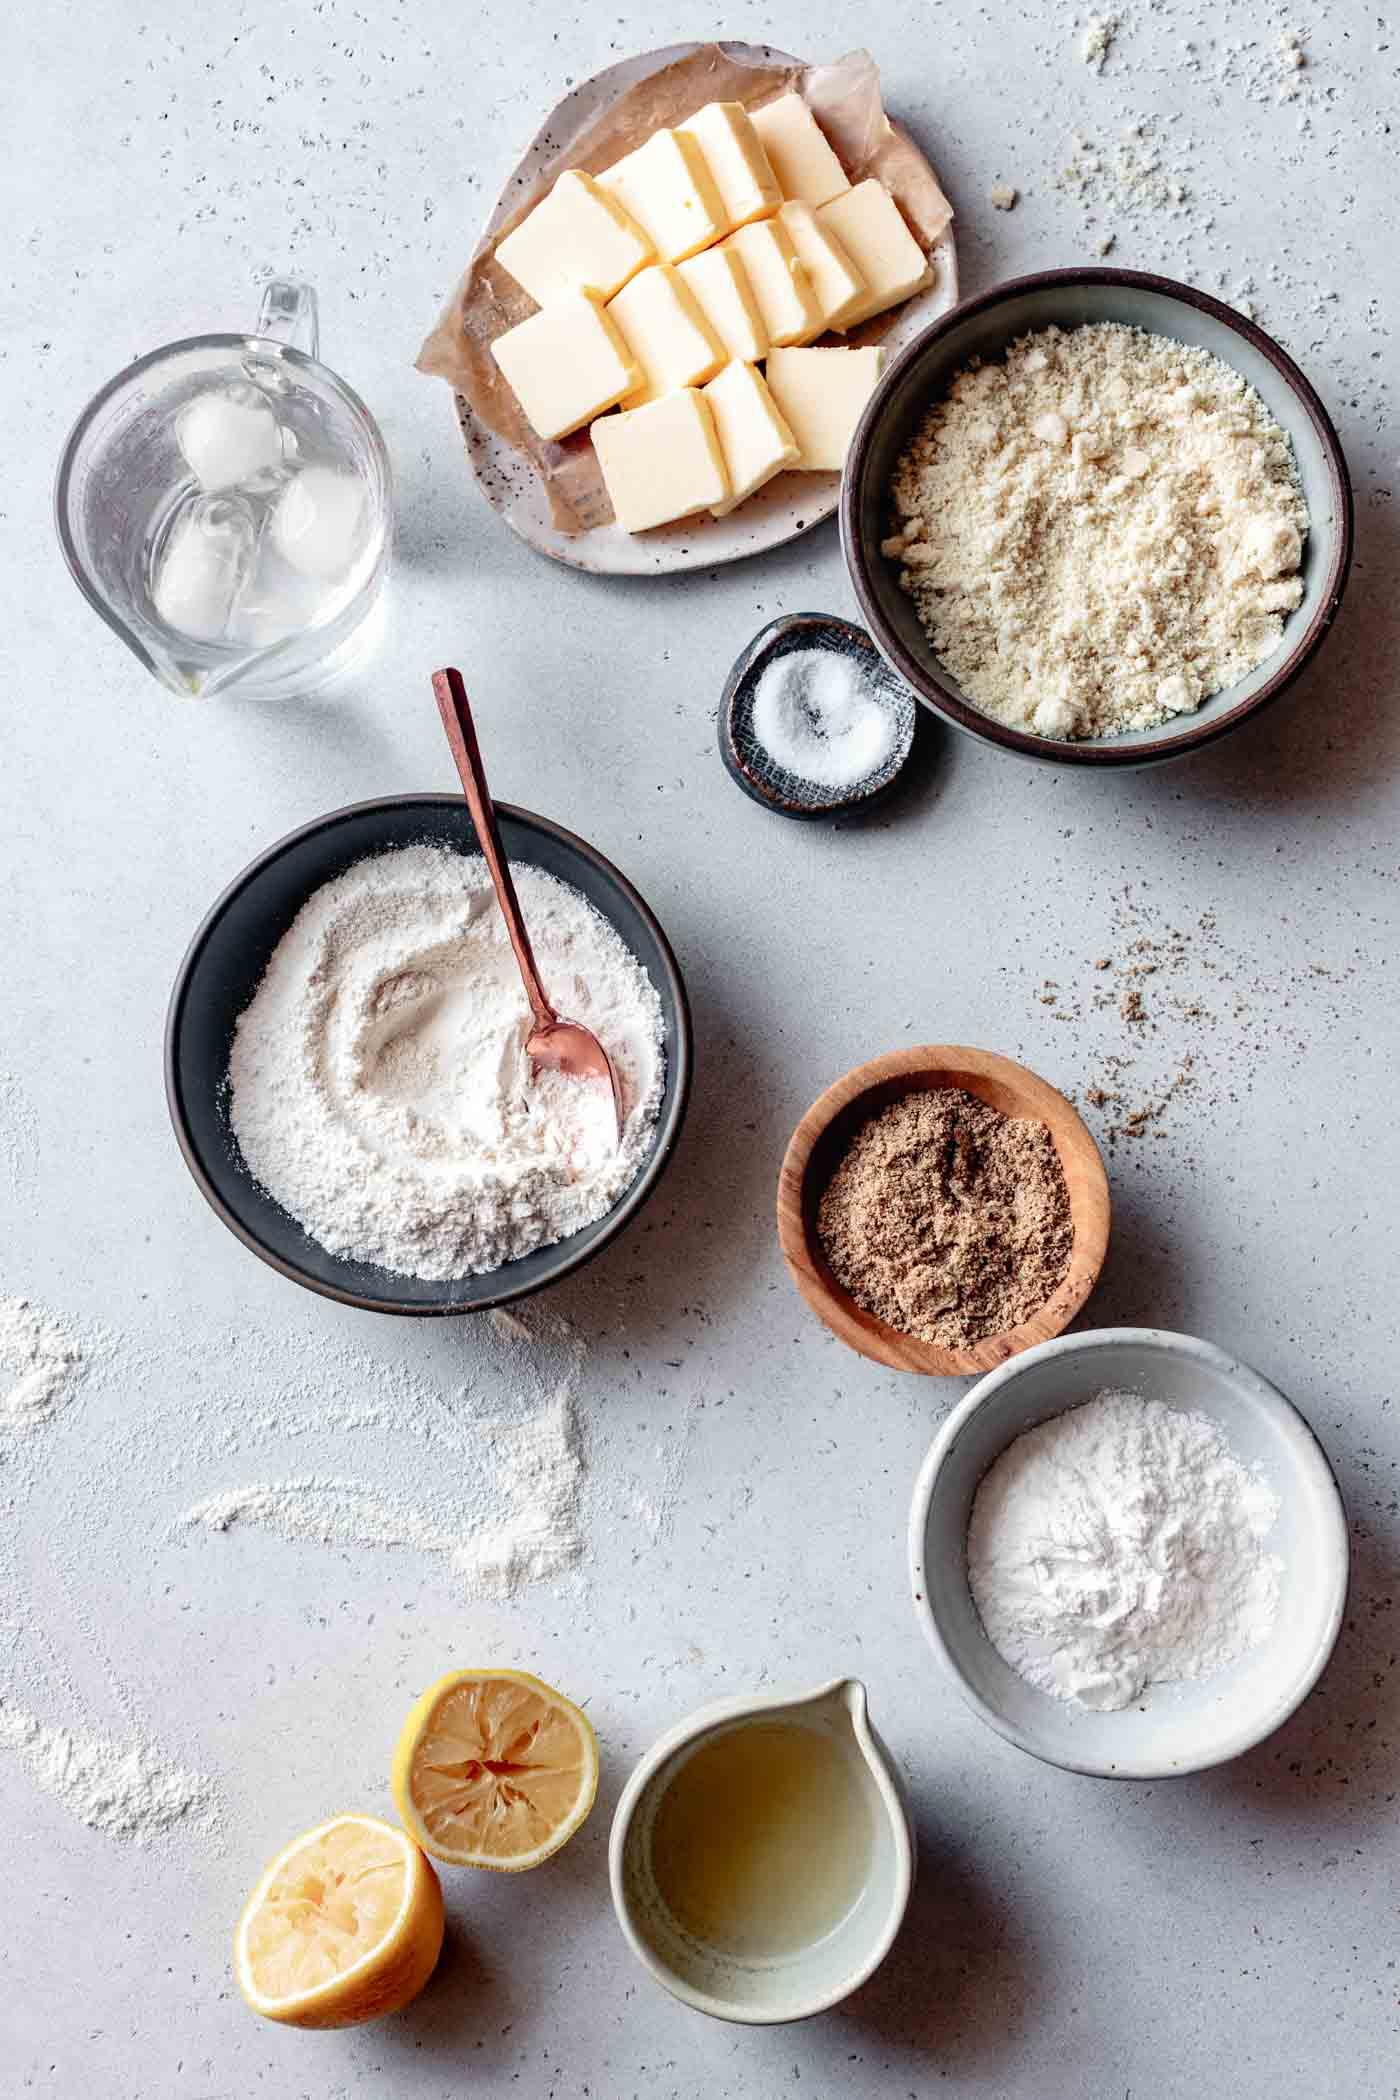 ingredients for paleo pie crust recipe